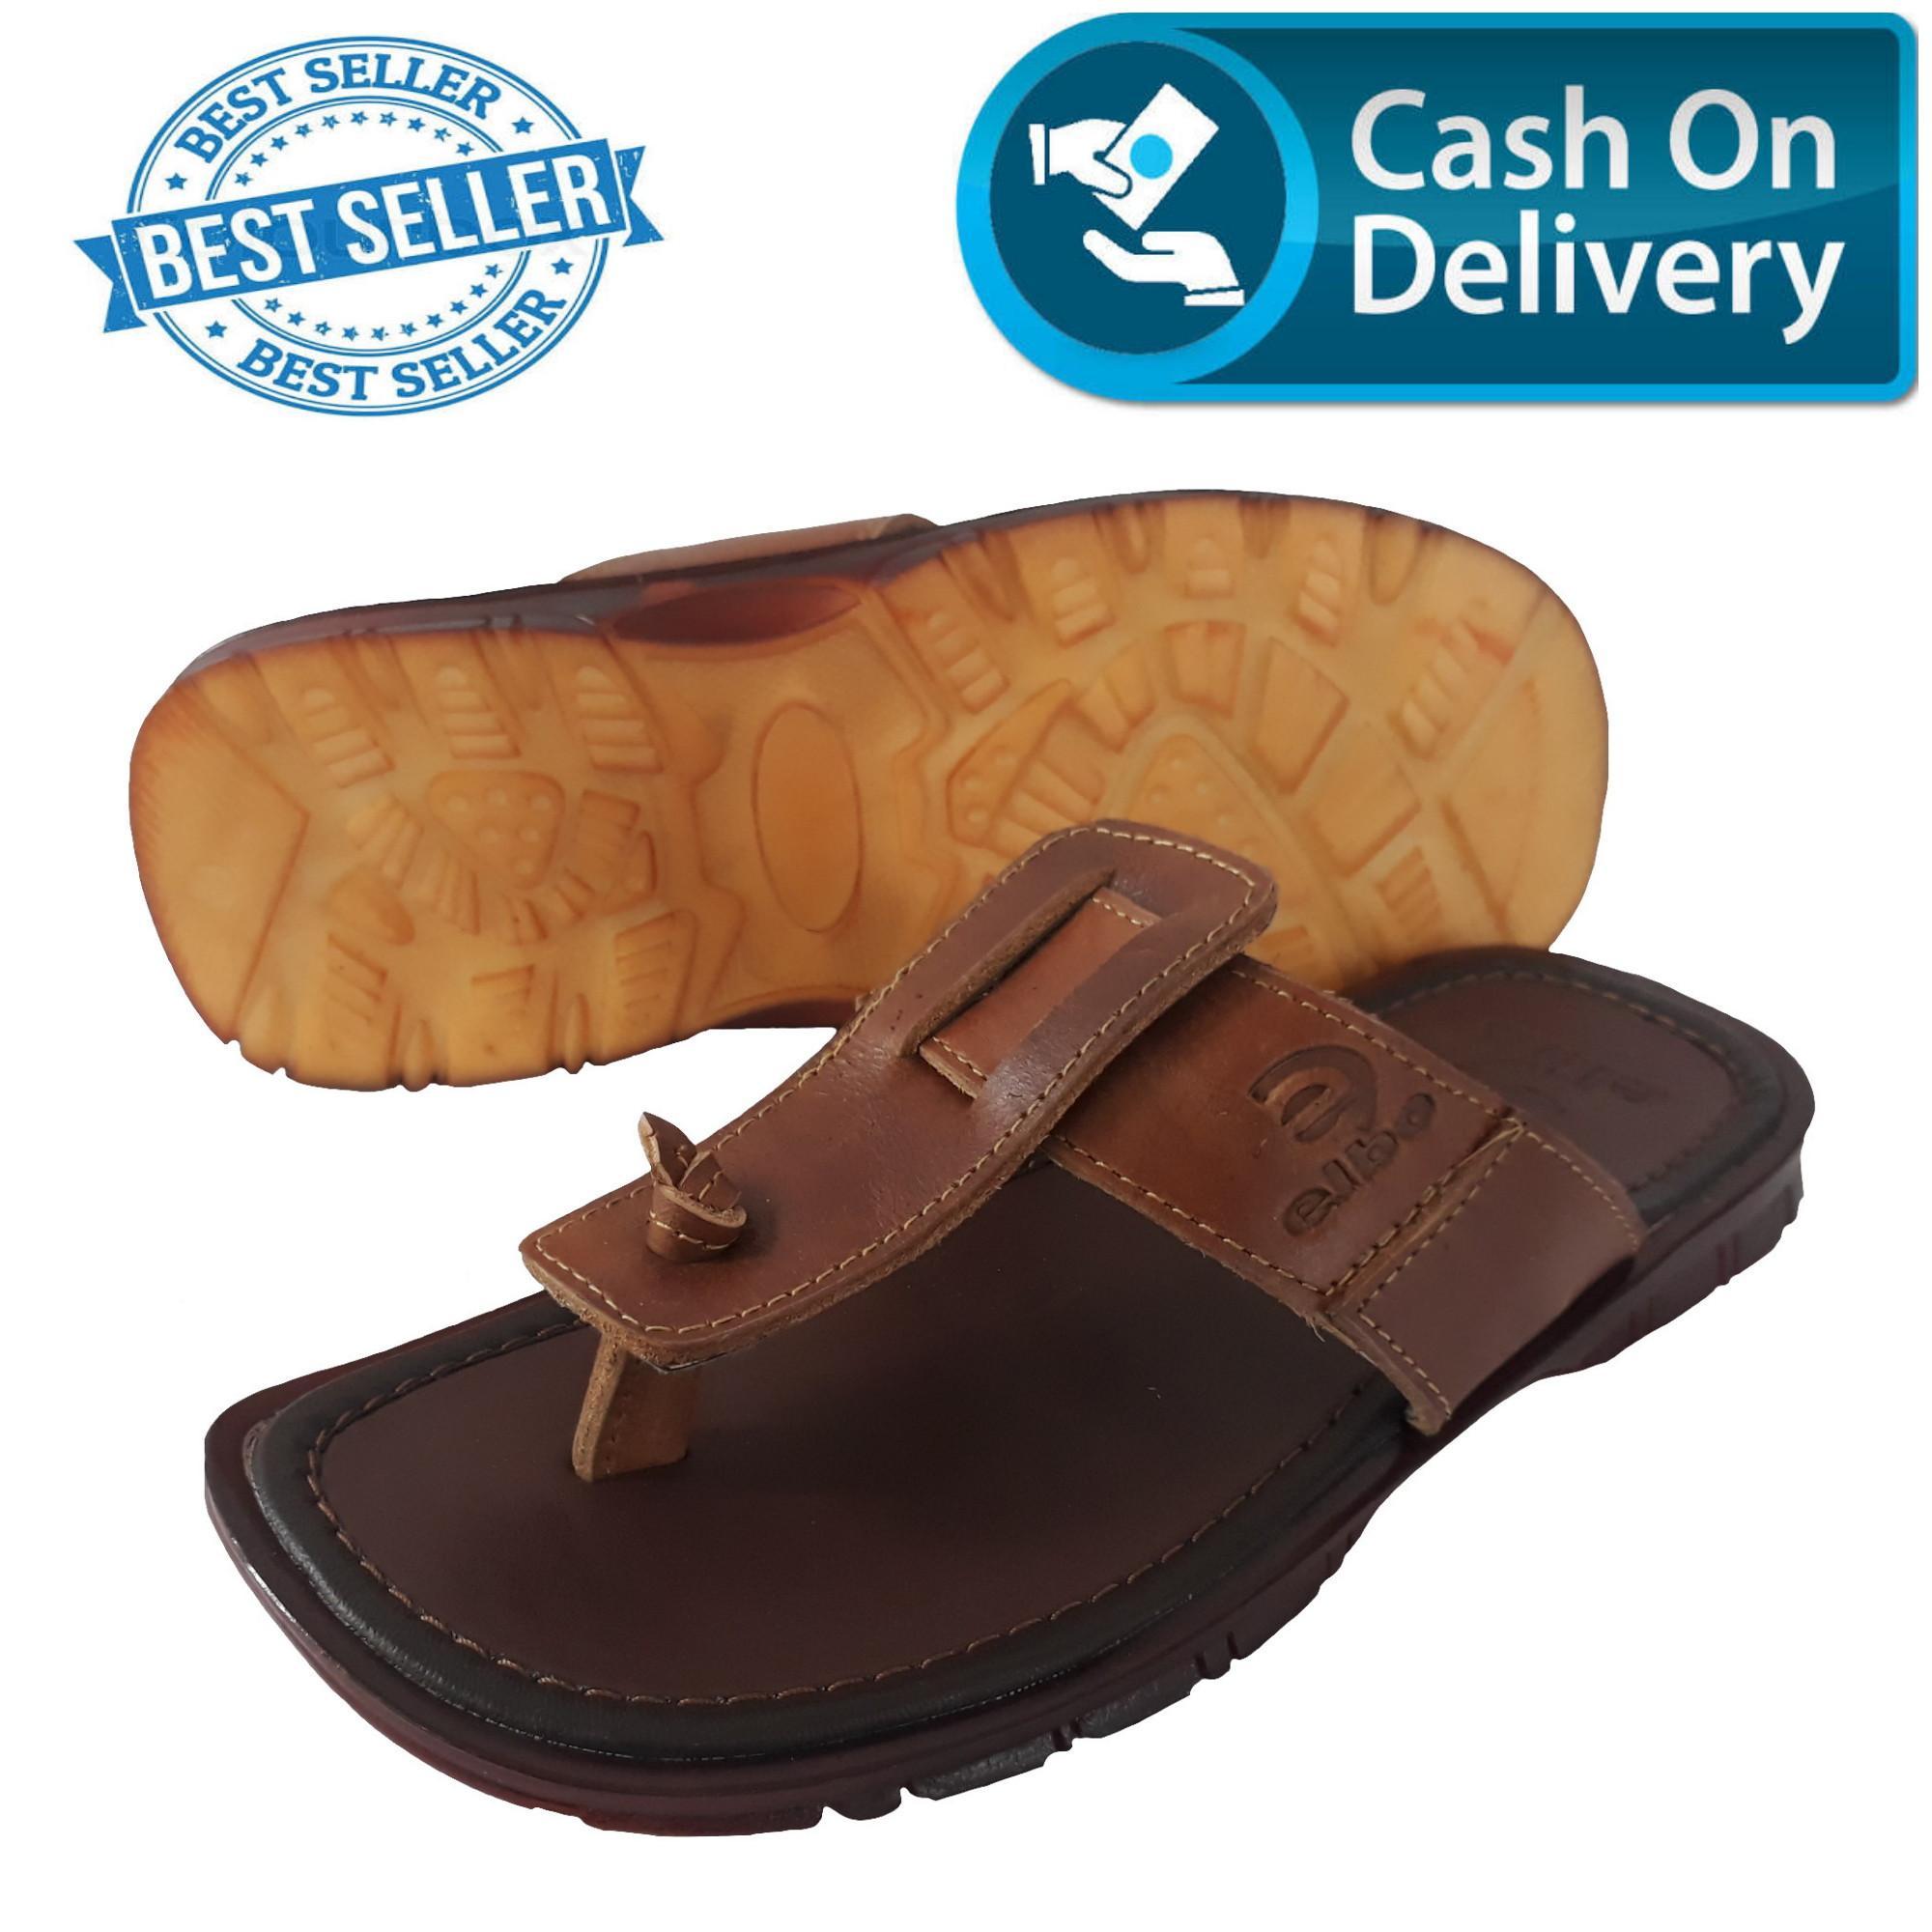 Beli Sandal Japit Store Marwanto606 Ando Surfer Girl Sepatu Sendal Anak Free Shipping Jabodetabek Kulit Pria Sapi Asli Model